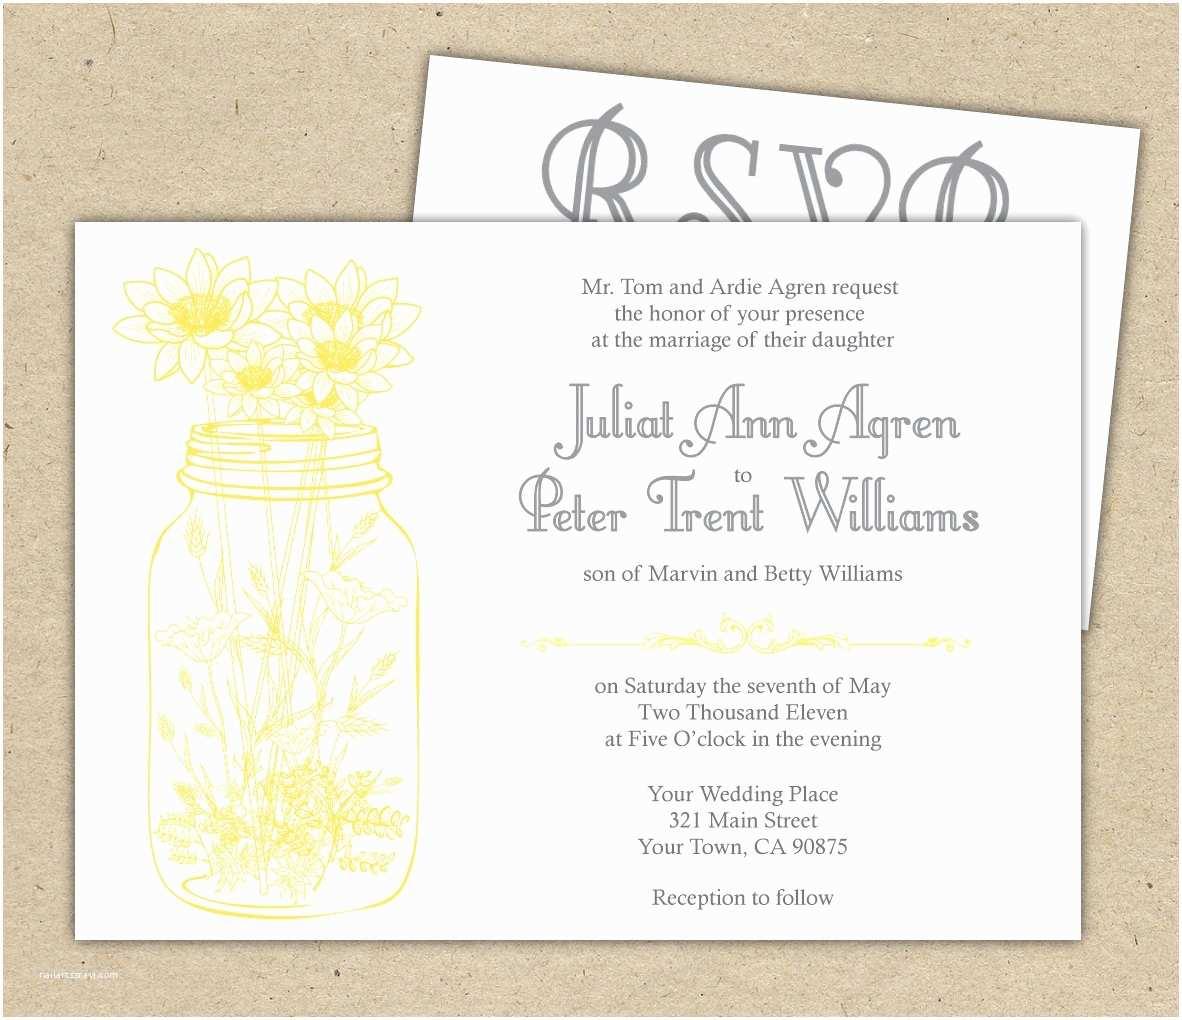 Wedding Invitation Email Rsvp Wedding Invitation Wording Wedding Rsvp Follow Up